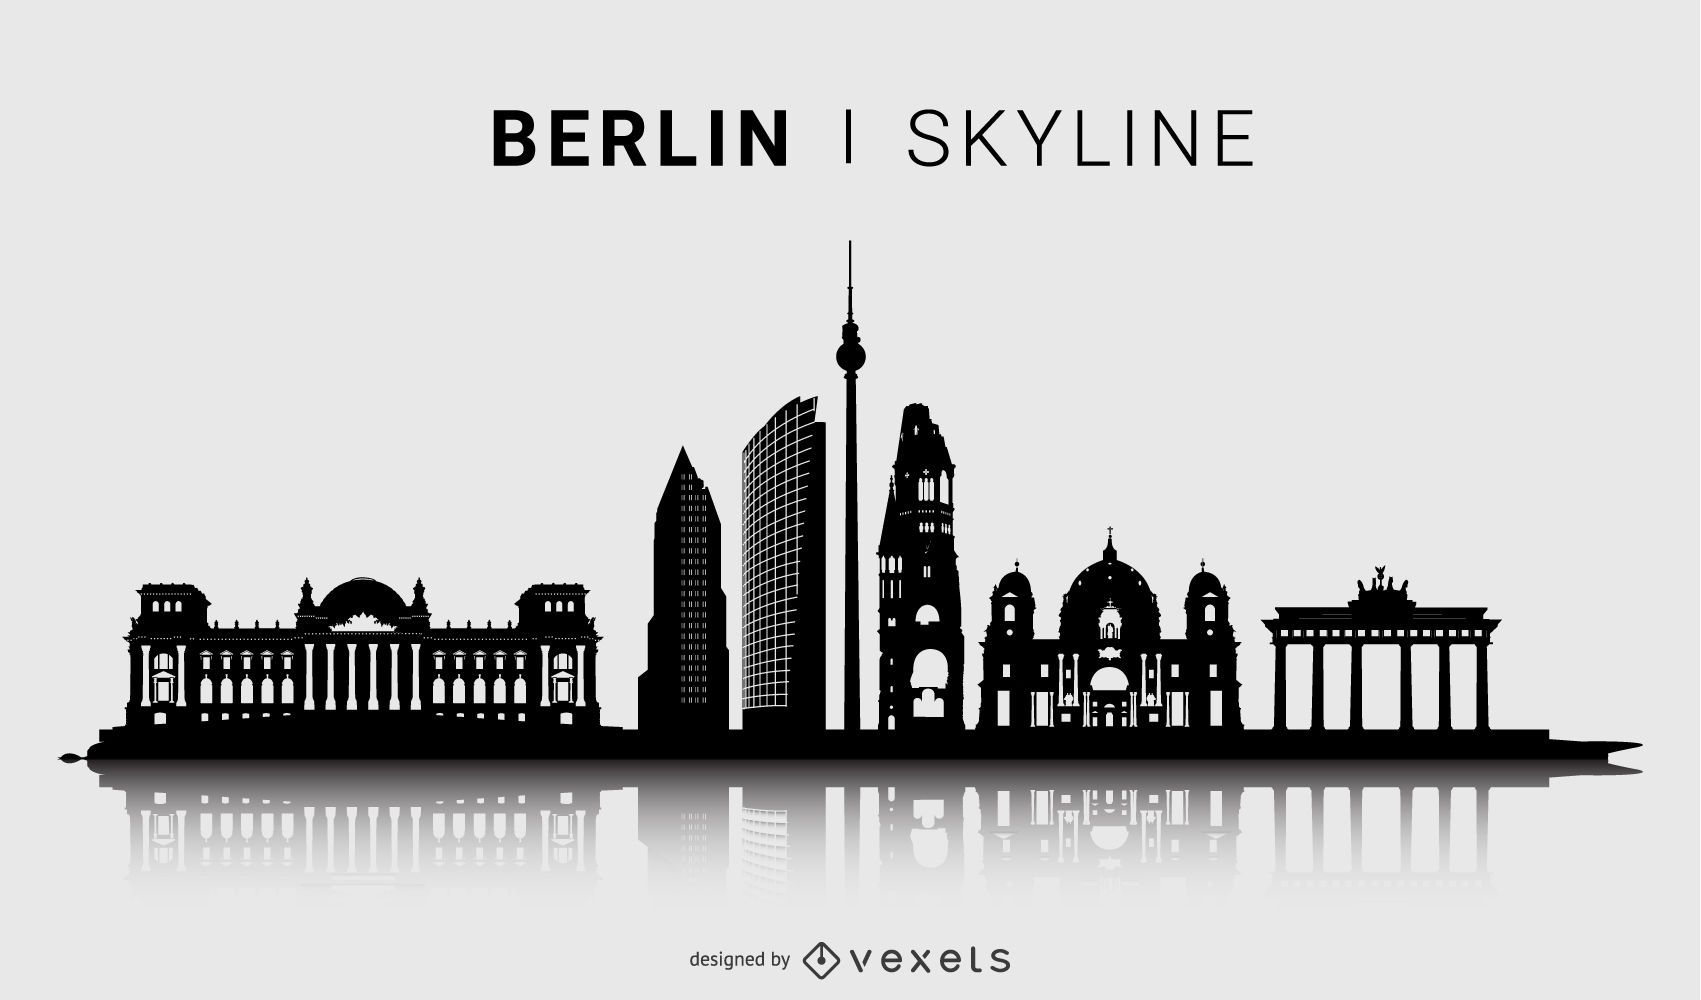 Berlin Skyline Silhouette Design